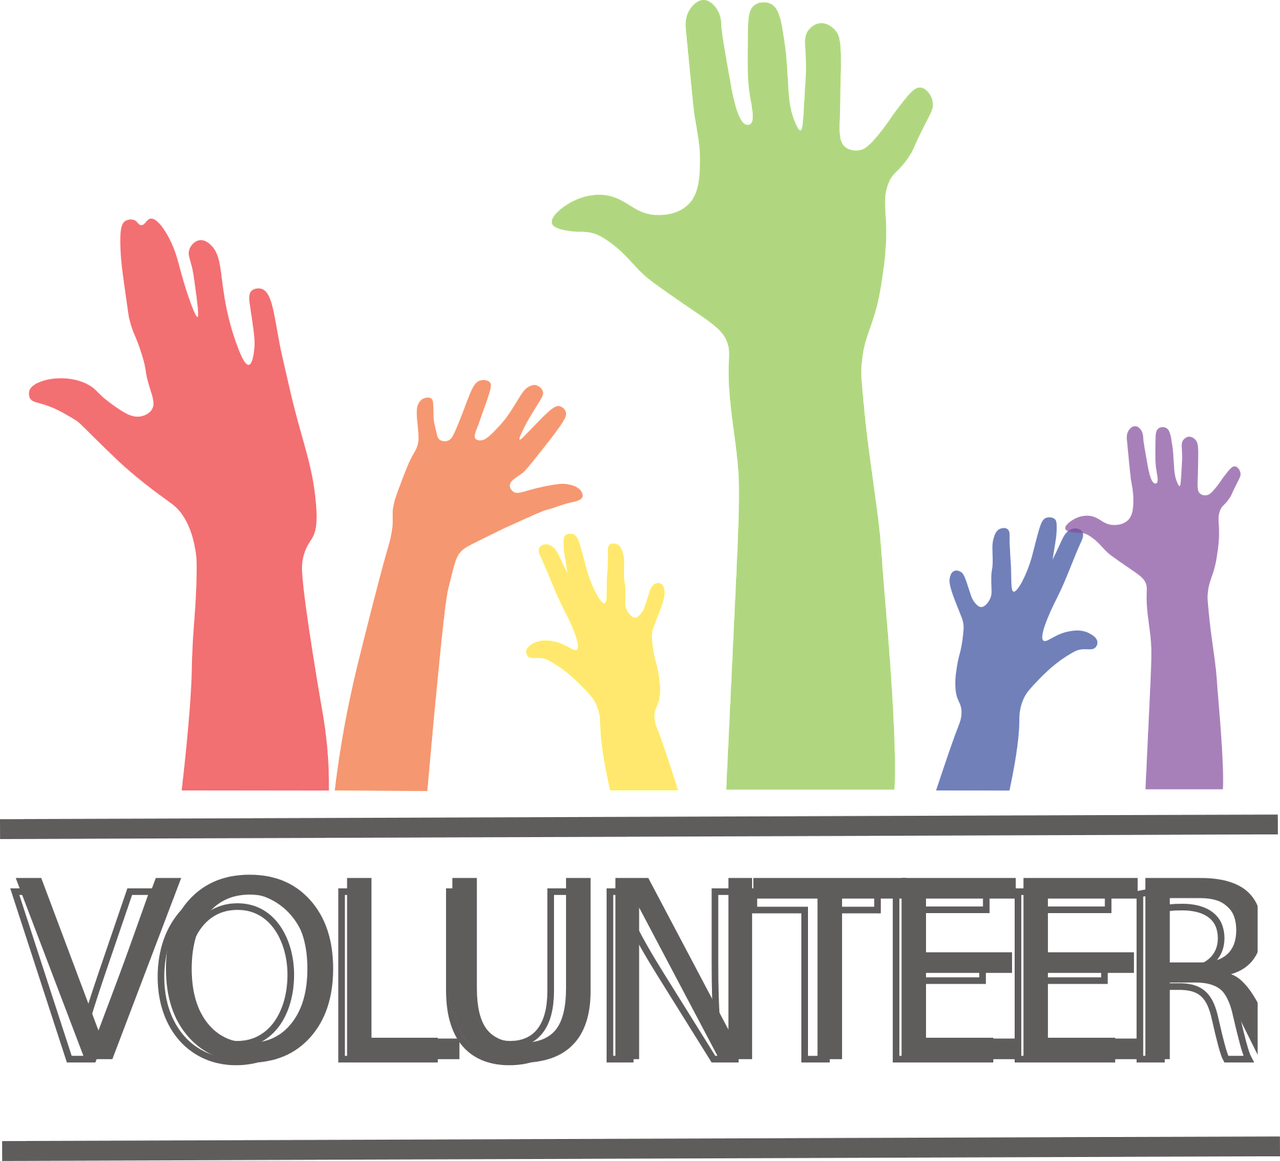 Volunteer Check-in